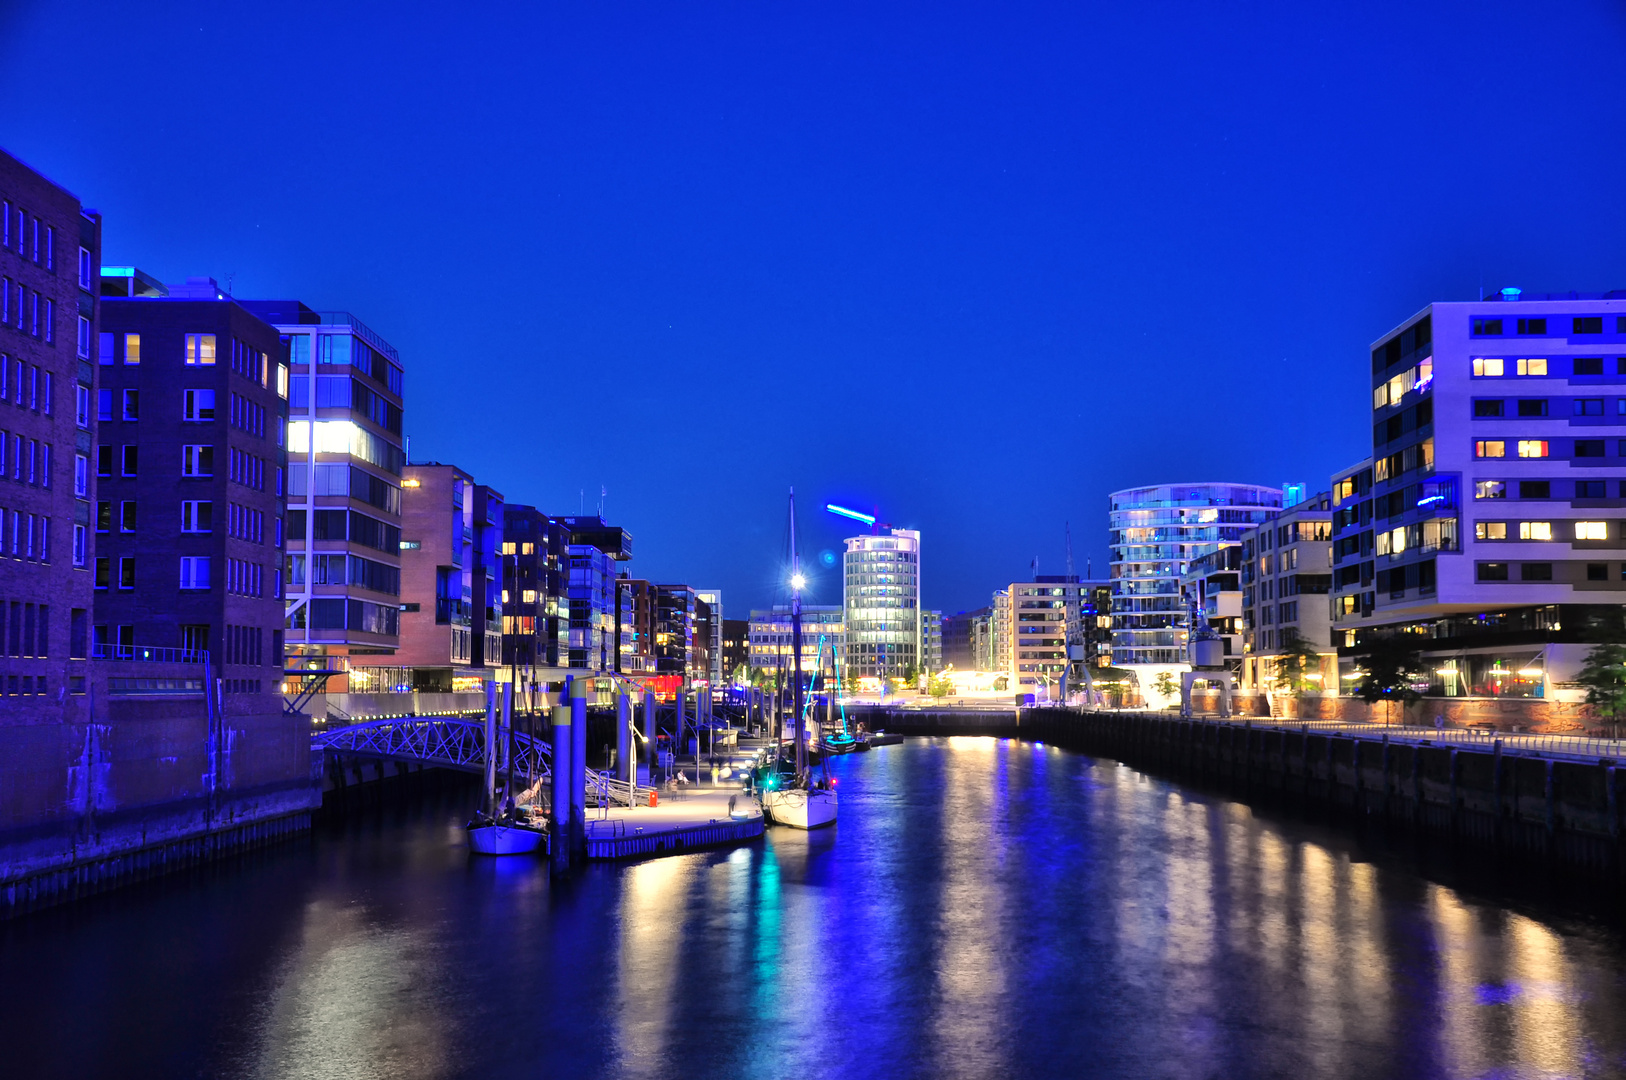 Hafencity blue night